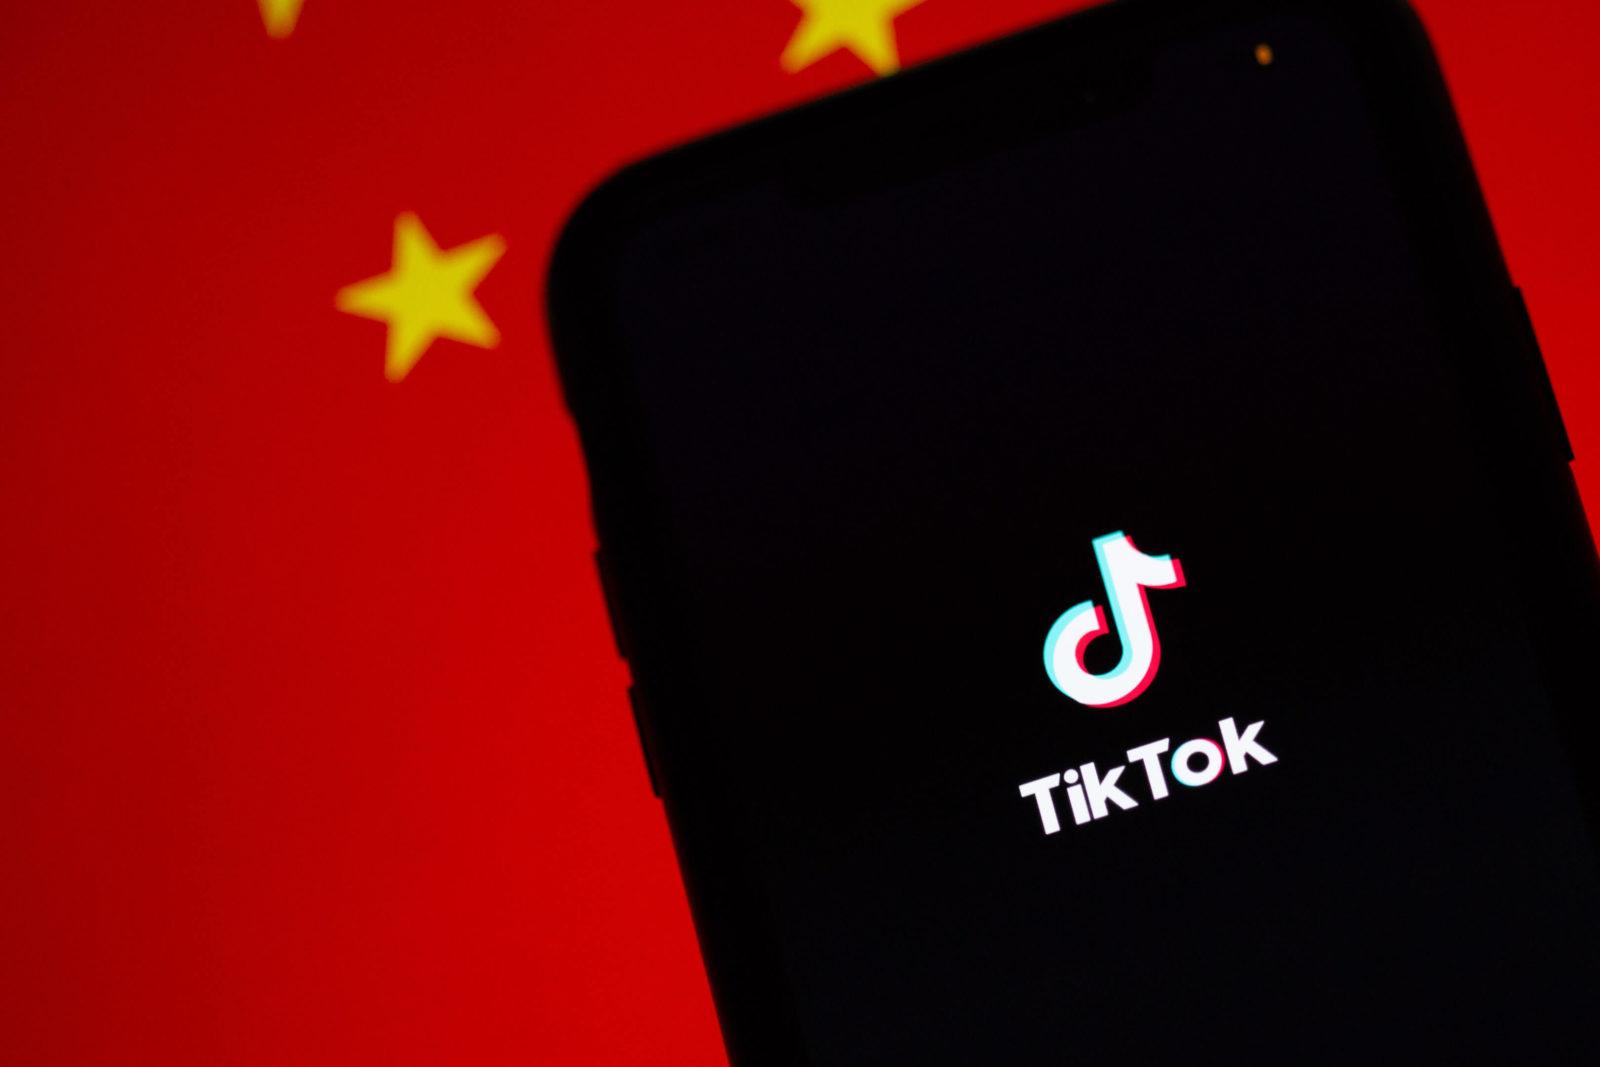 La fin de TikTok aux Etats-Unis ?